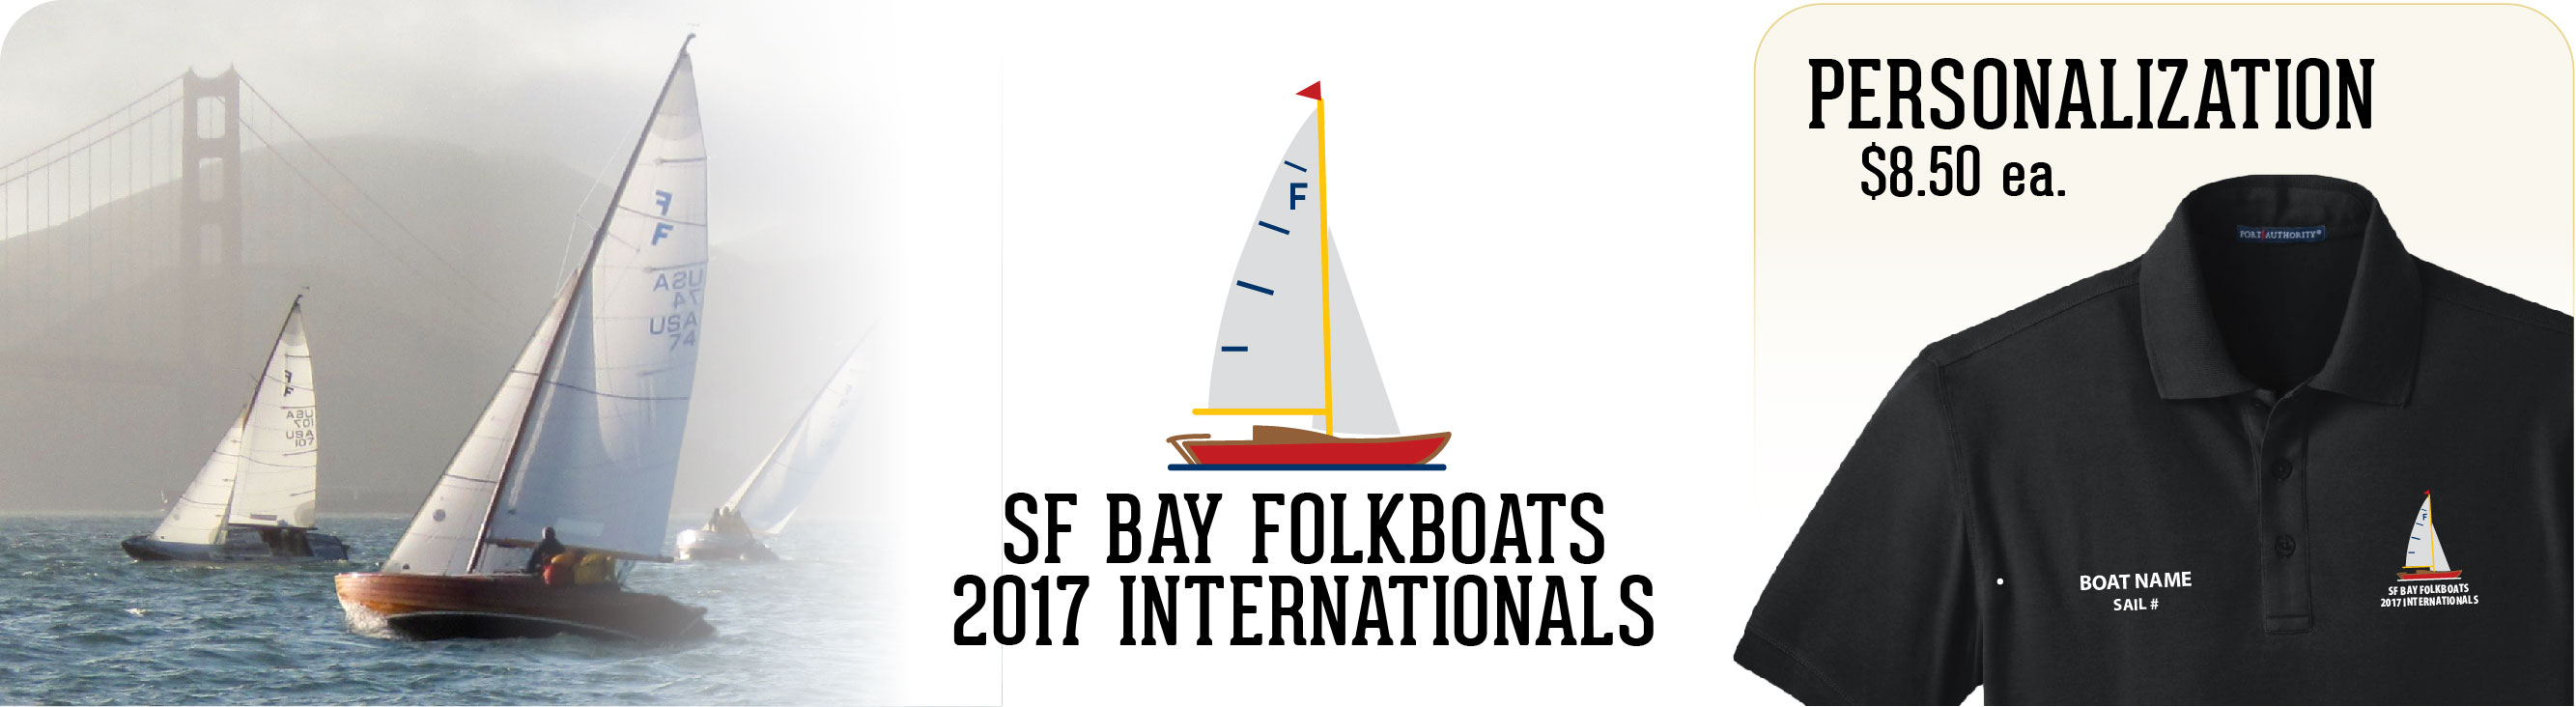 corinthian-yc-folkboat-internationals-2017-banner-01.jpg